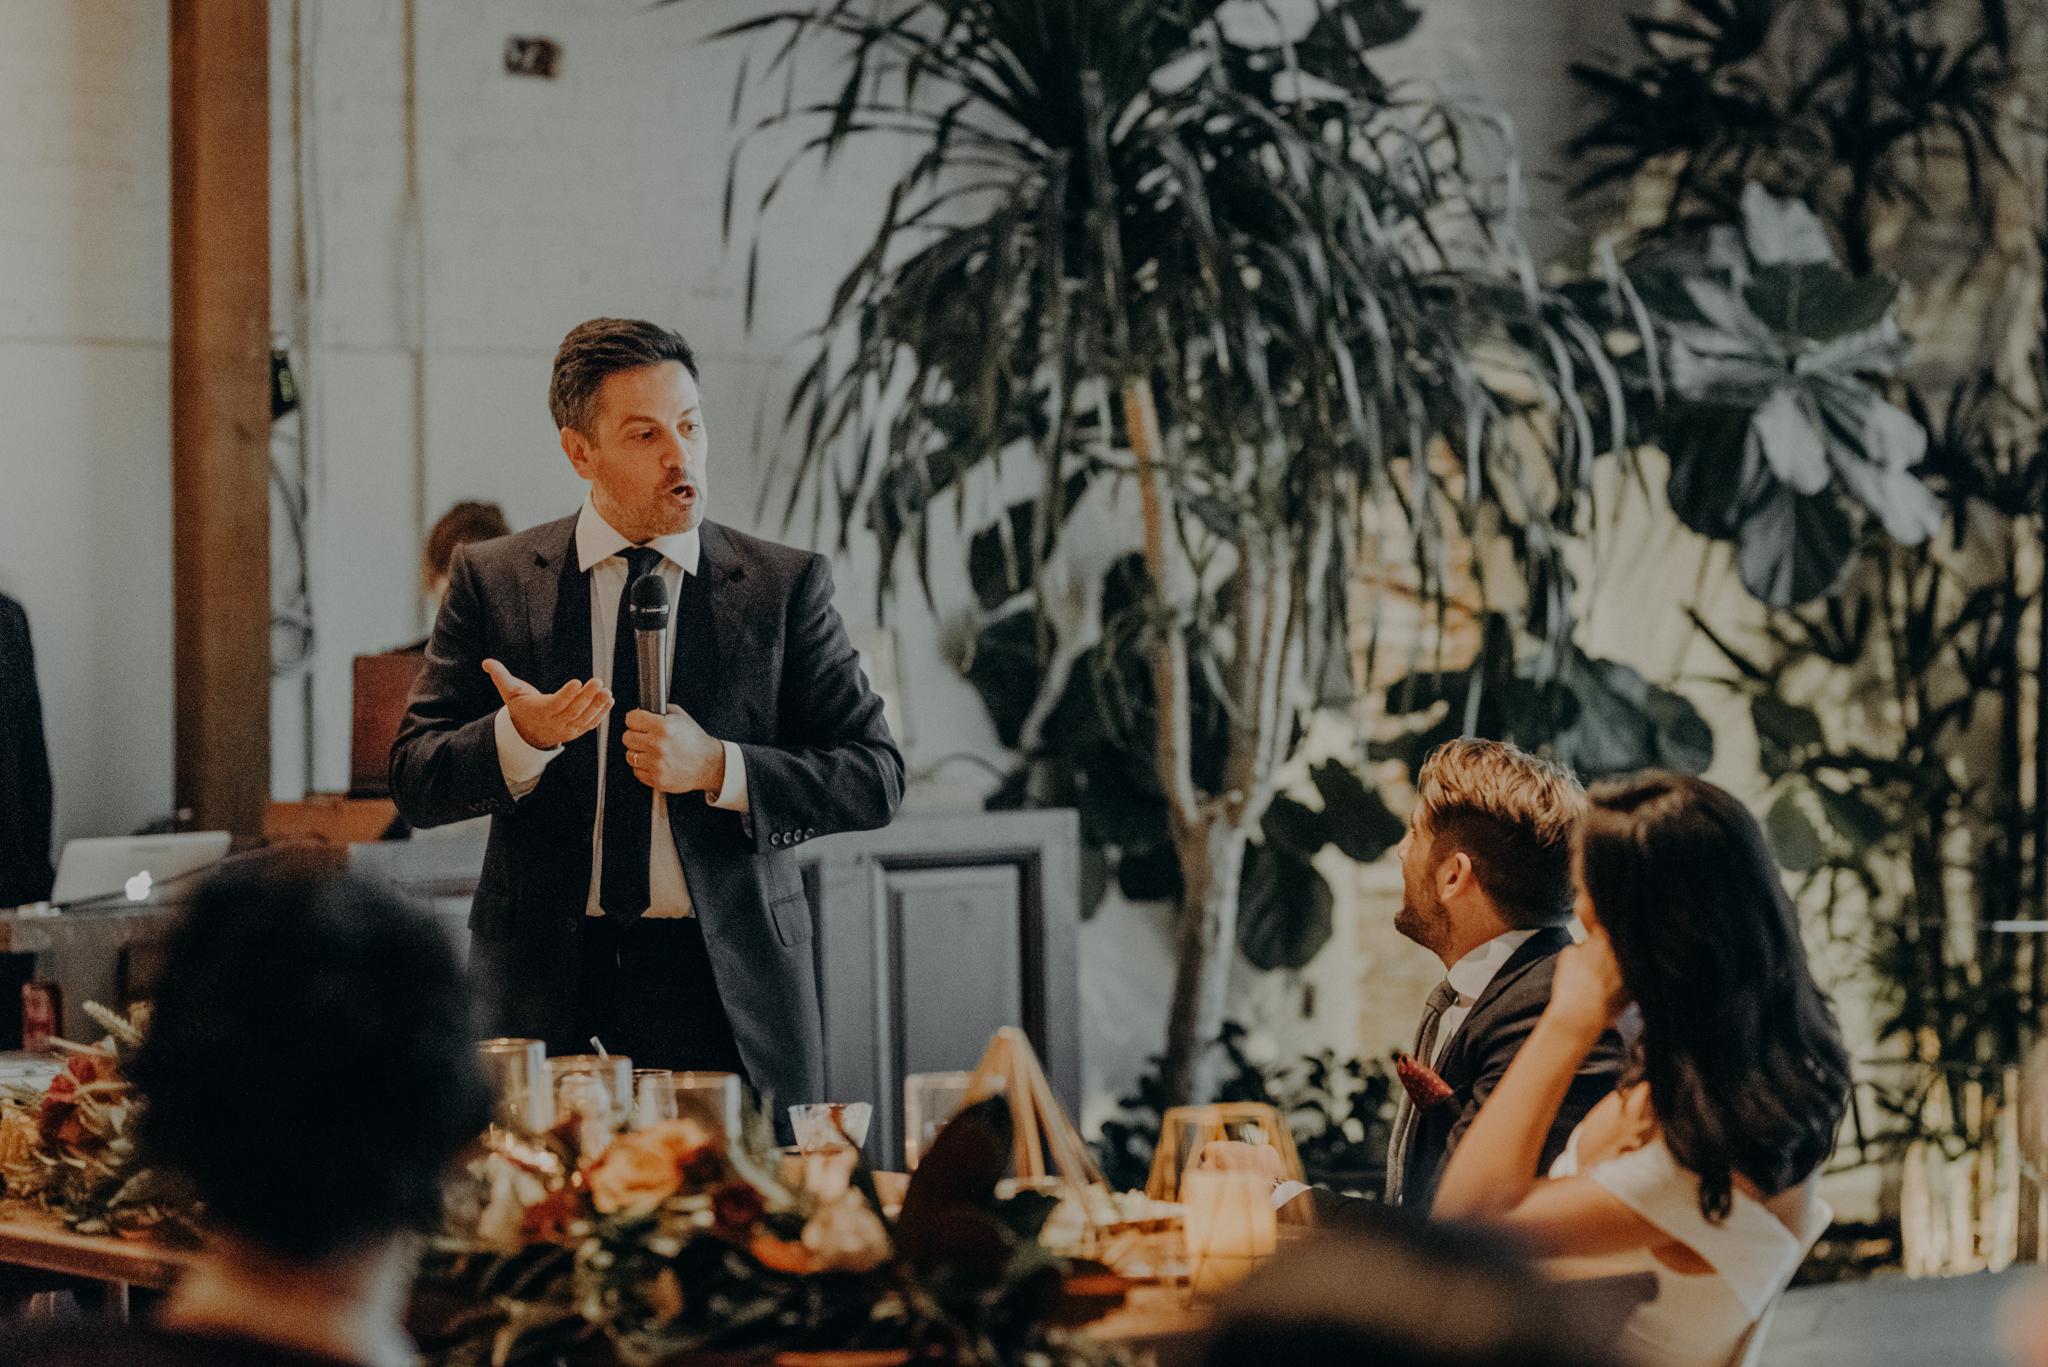 Wedding Photo LA - wedding photographer in los angeles - millwick wedding venue -isaiahandtaylor.com-128.jpg